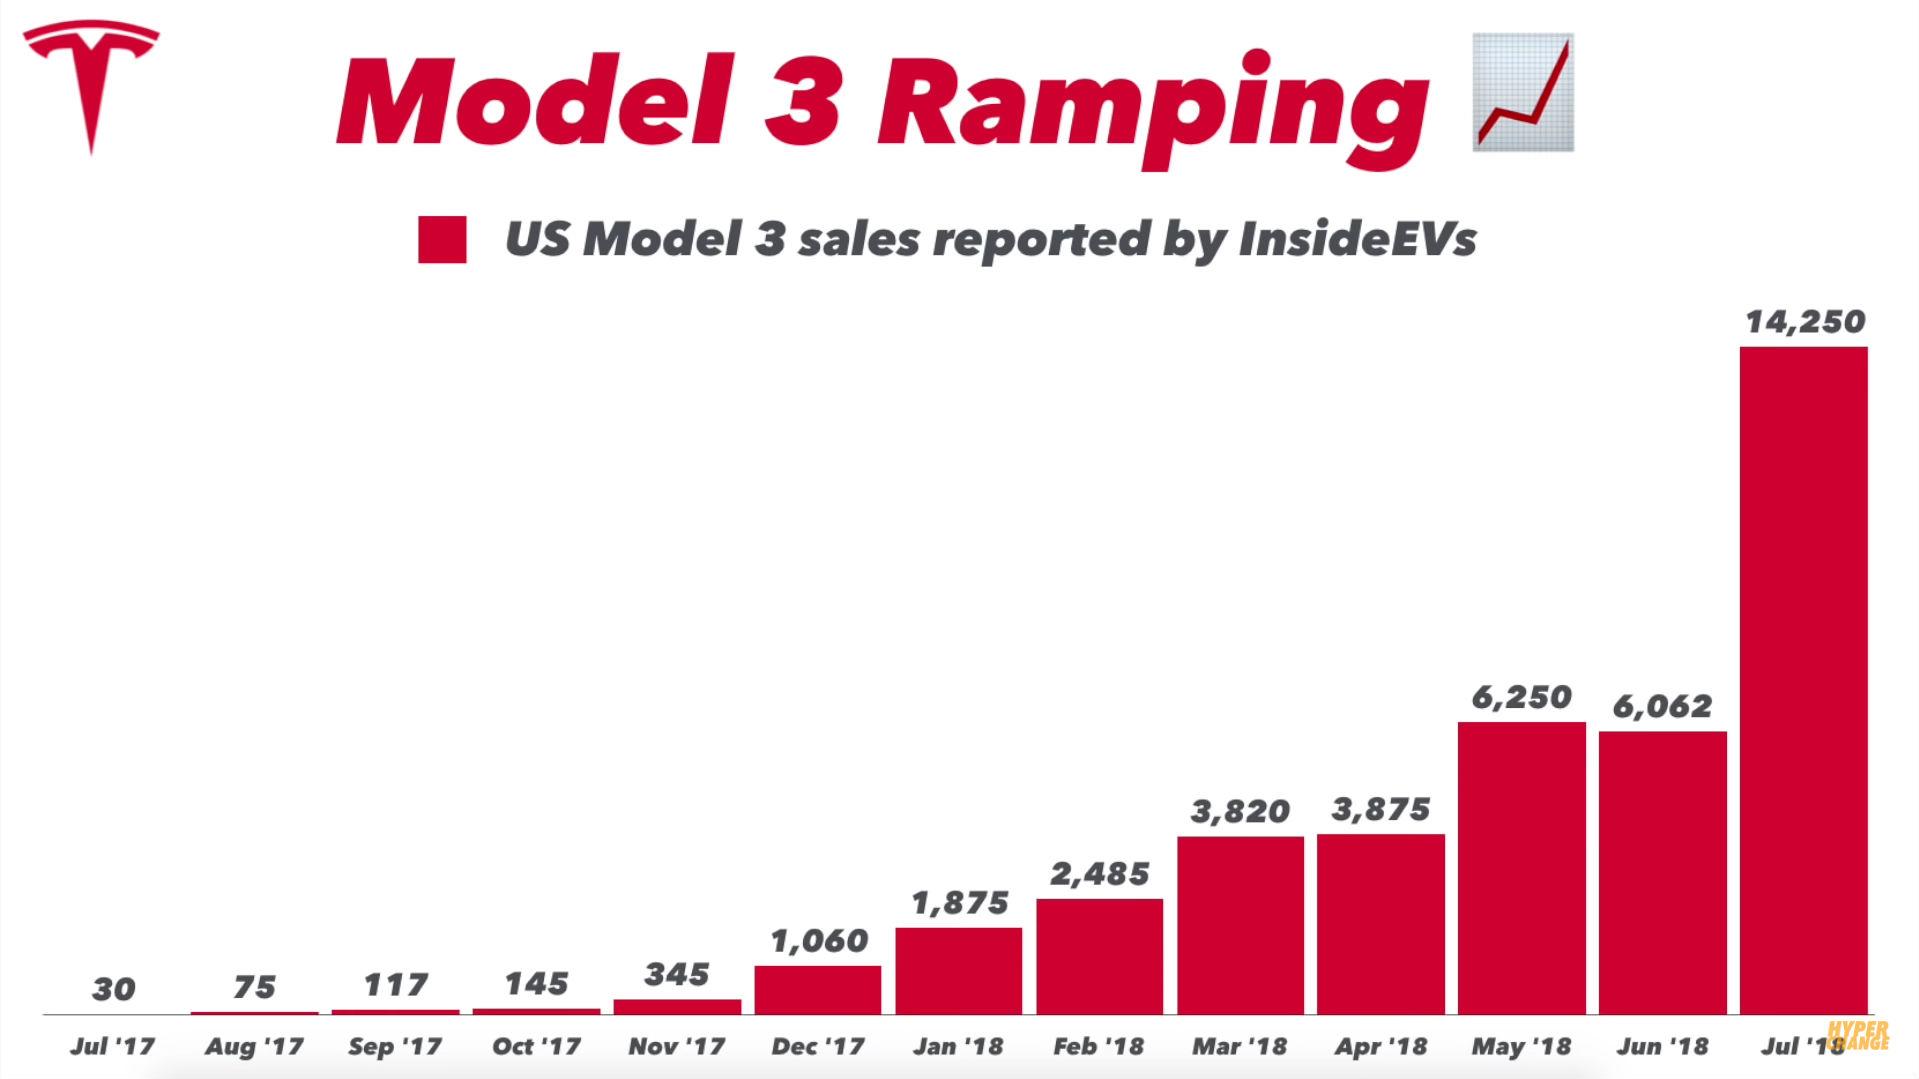 model-3-estimates-july-18